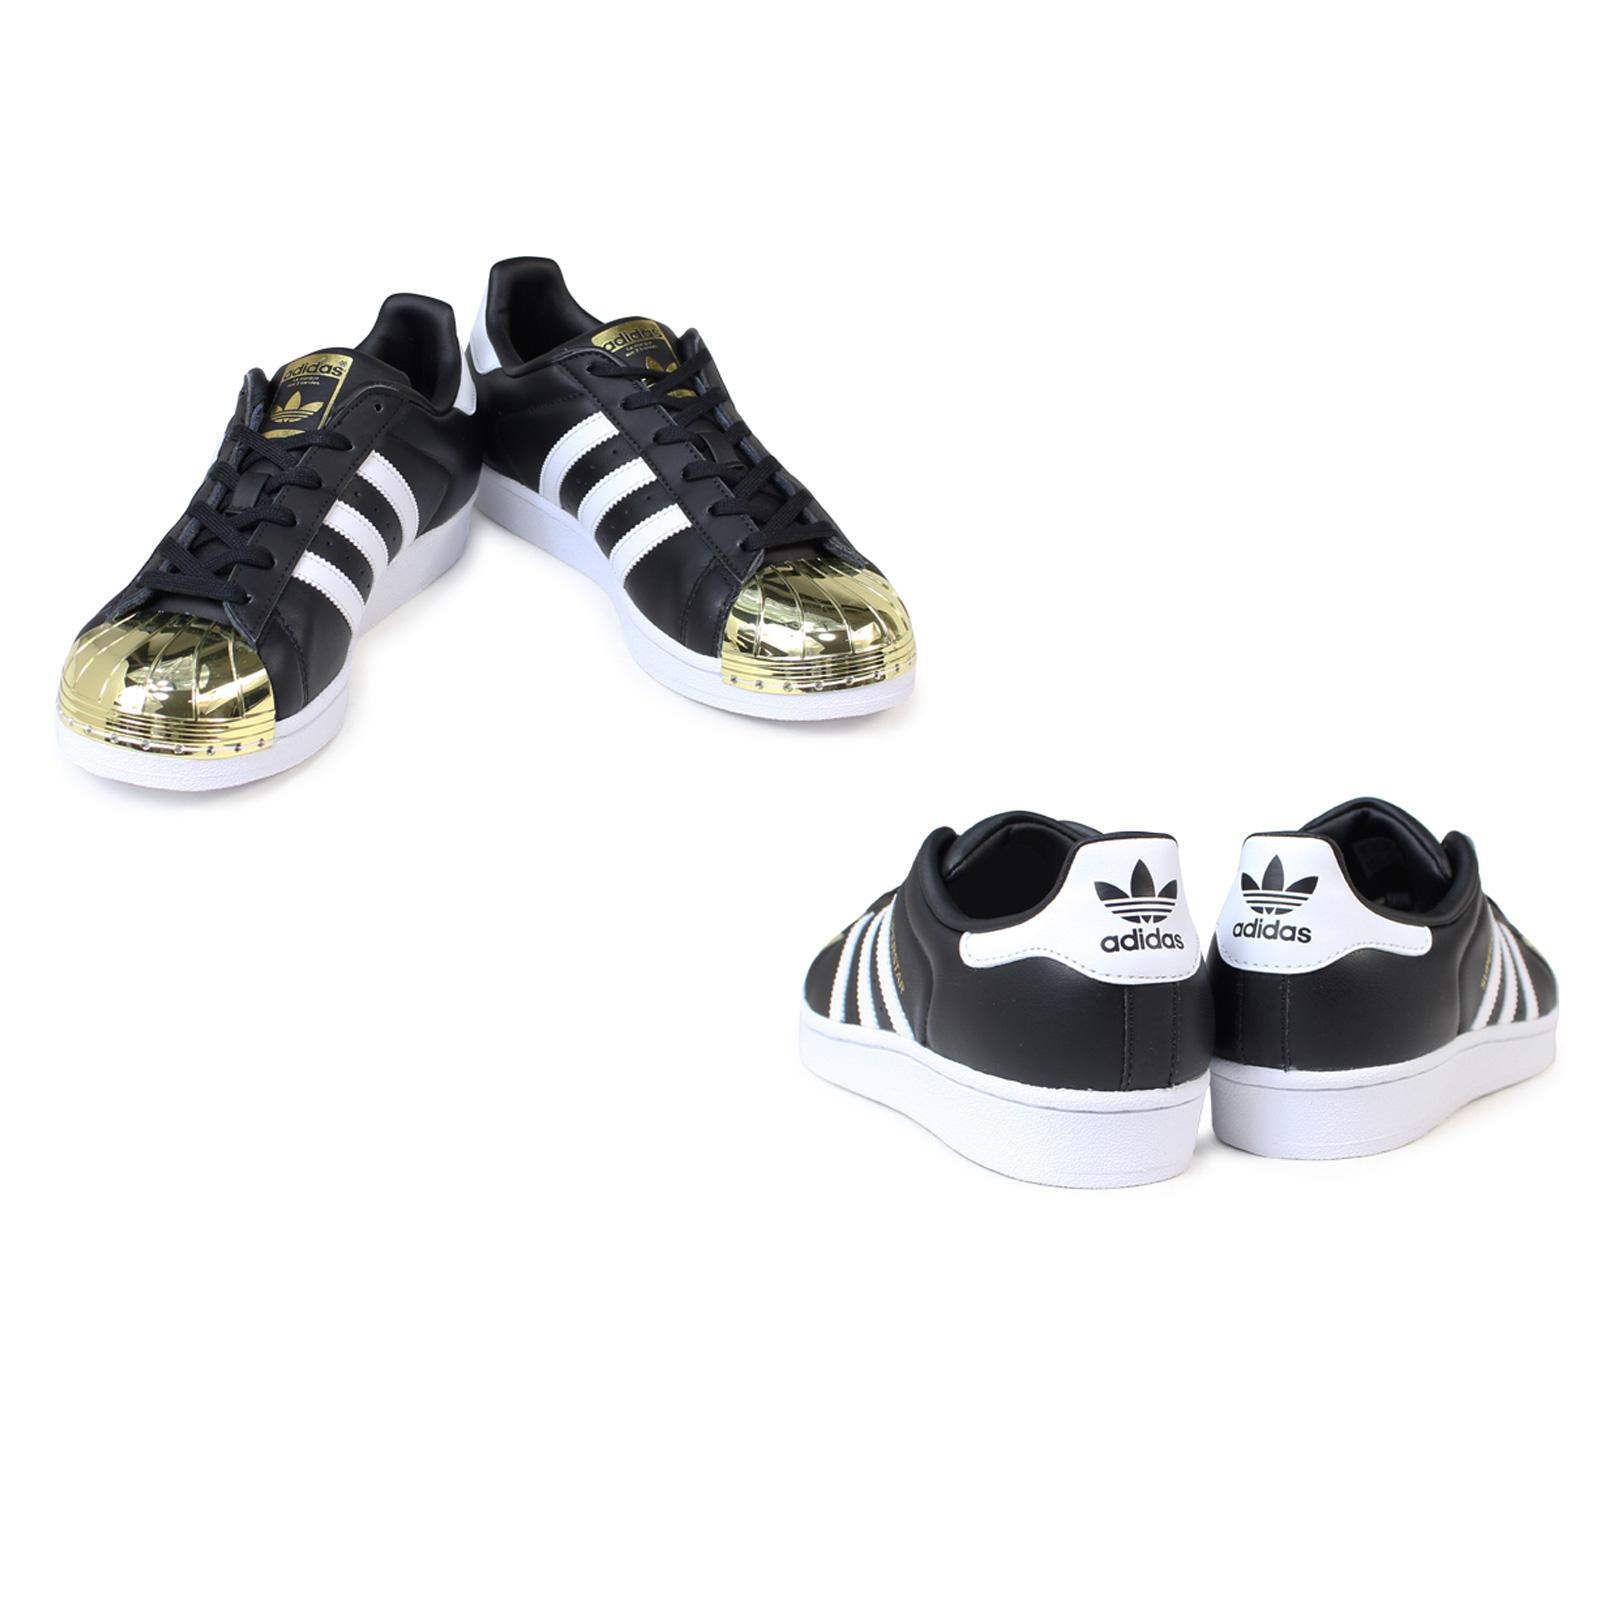 Adidas Schuhe Toe Leder Metal Bb5115 Gold Superstar Sneaker Originals Schwarz ym0wnvN8O